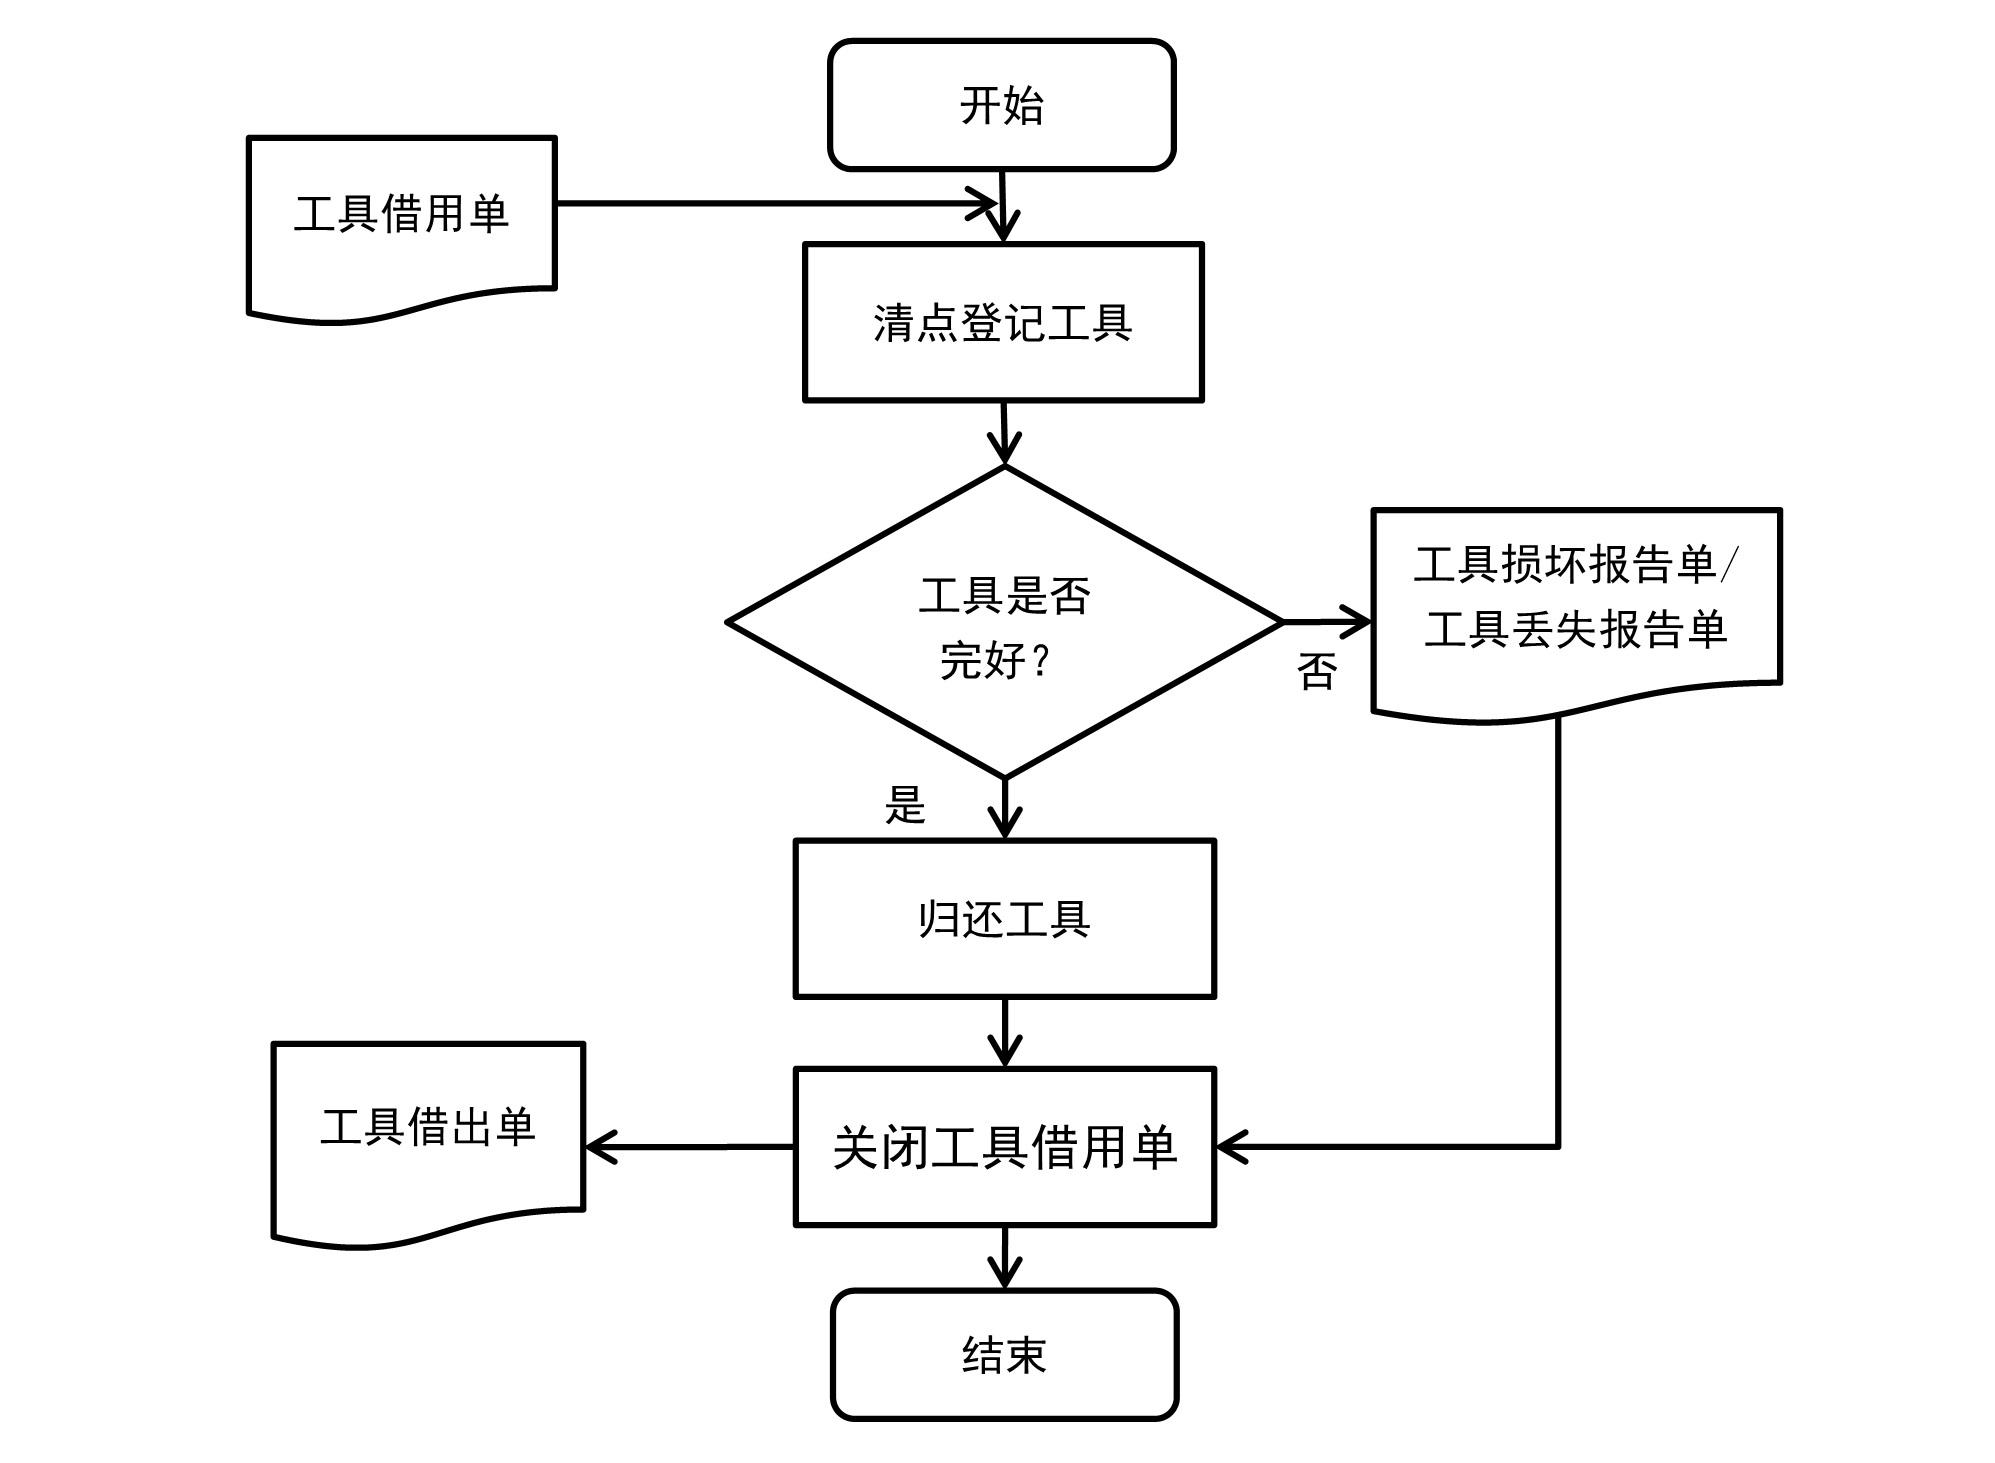 RFID工具归还流 程图